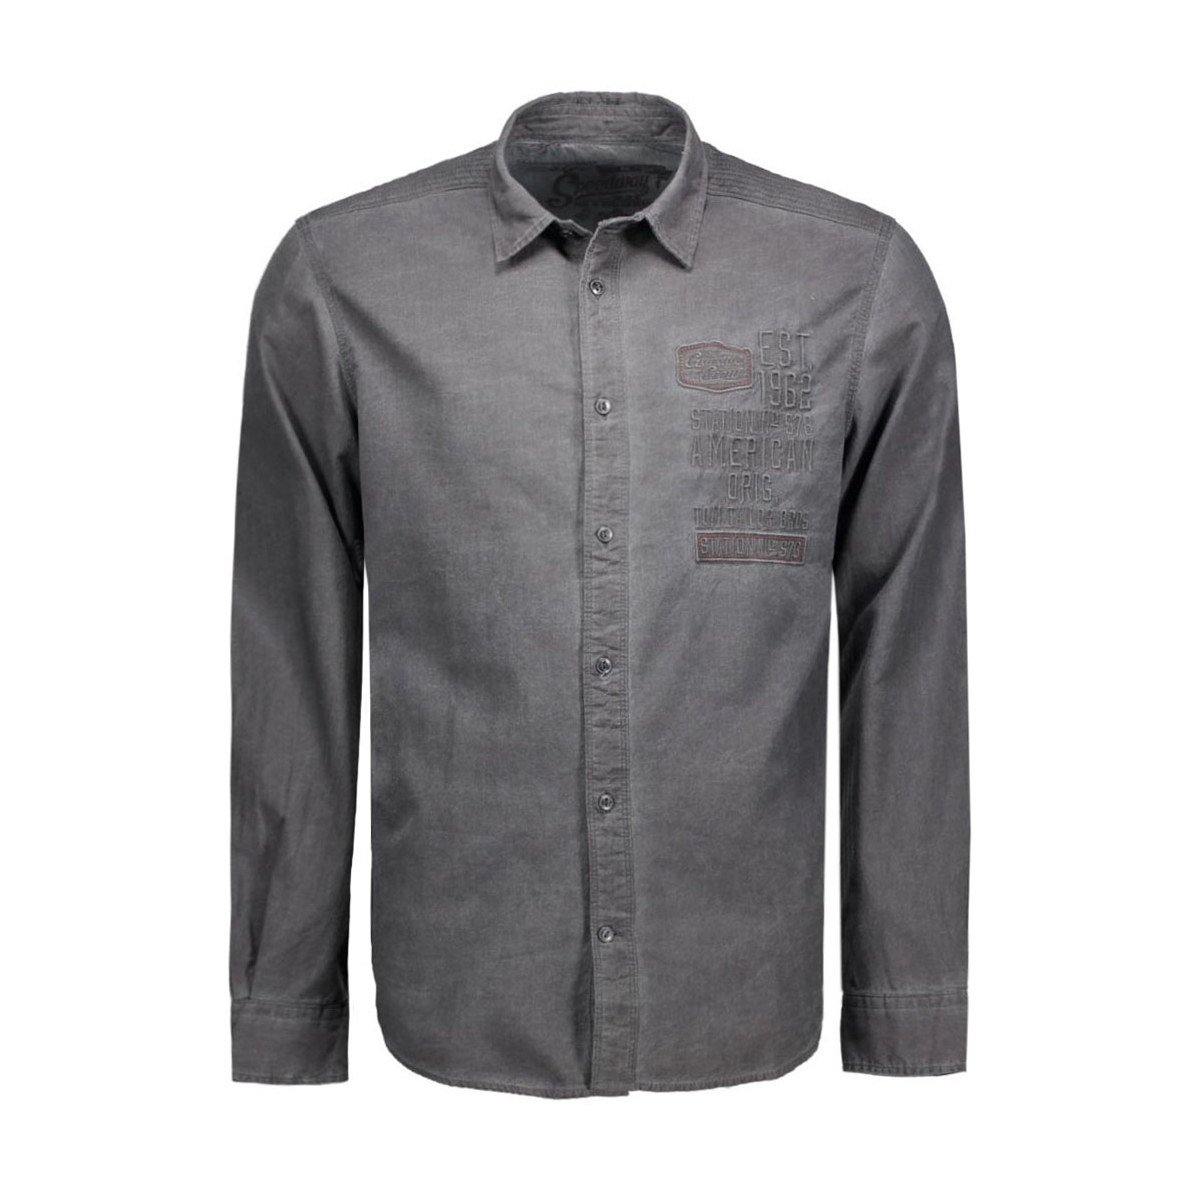 2032516.00.10 tom tailor polo 2983